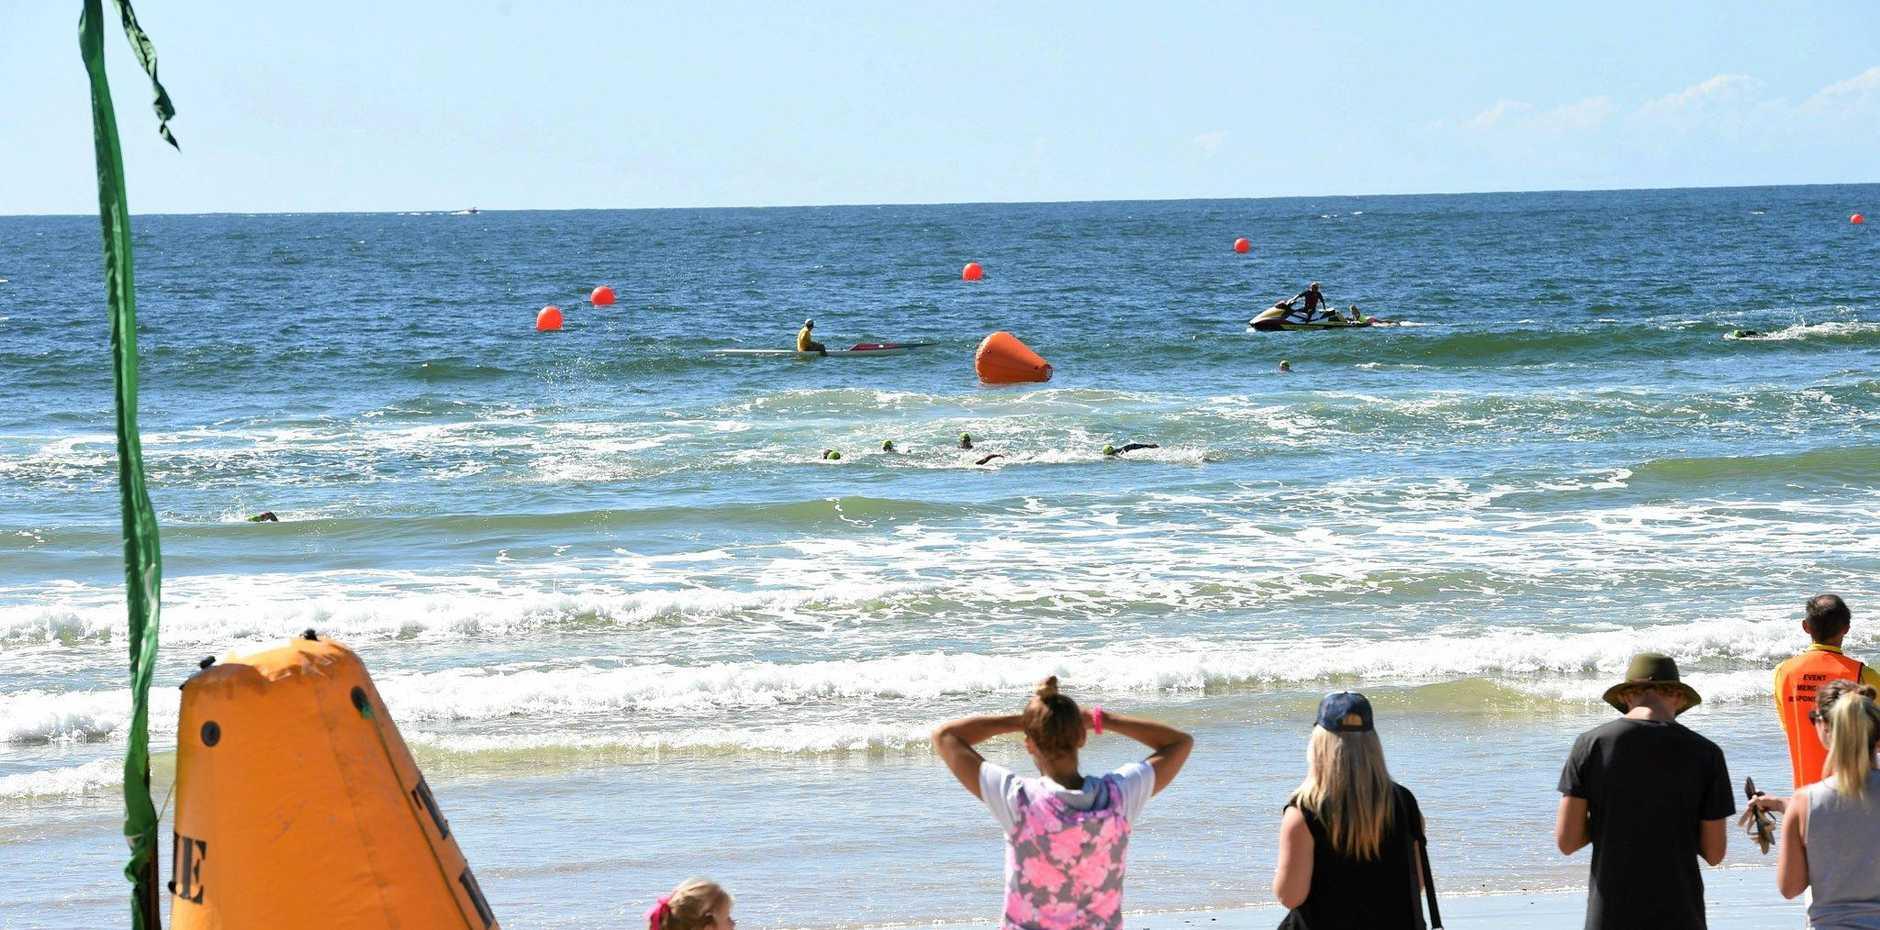 Byron Bay Triathlon at Main Beach in Byron Bay. Photo Marc Stapelberg / The Northern Star